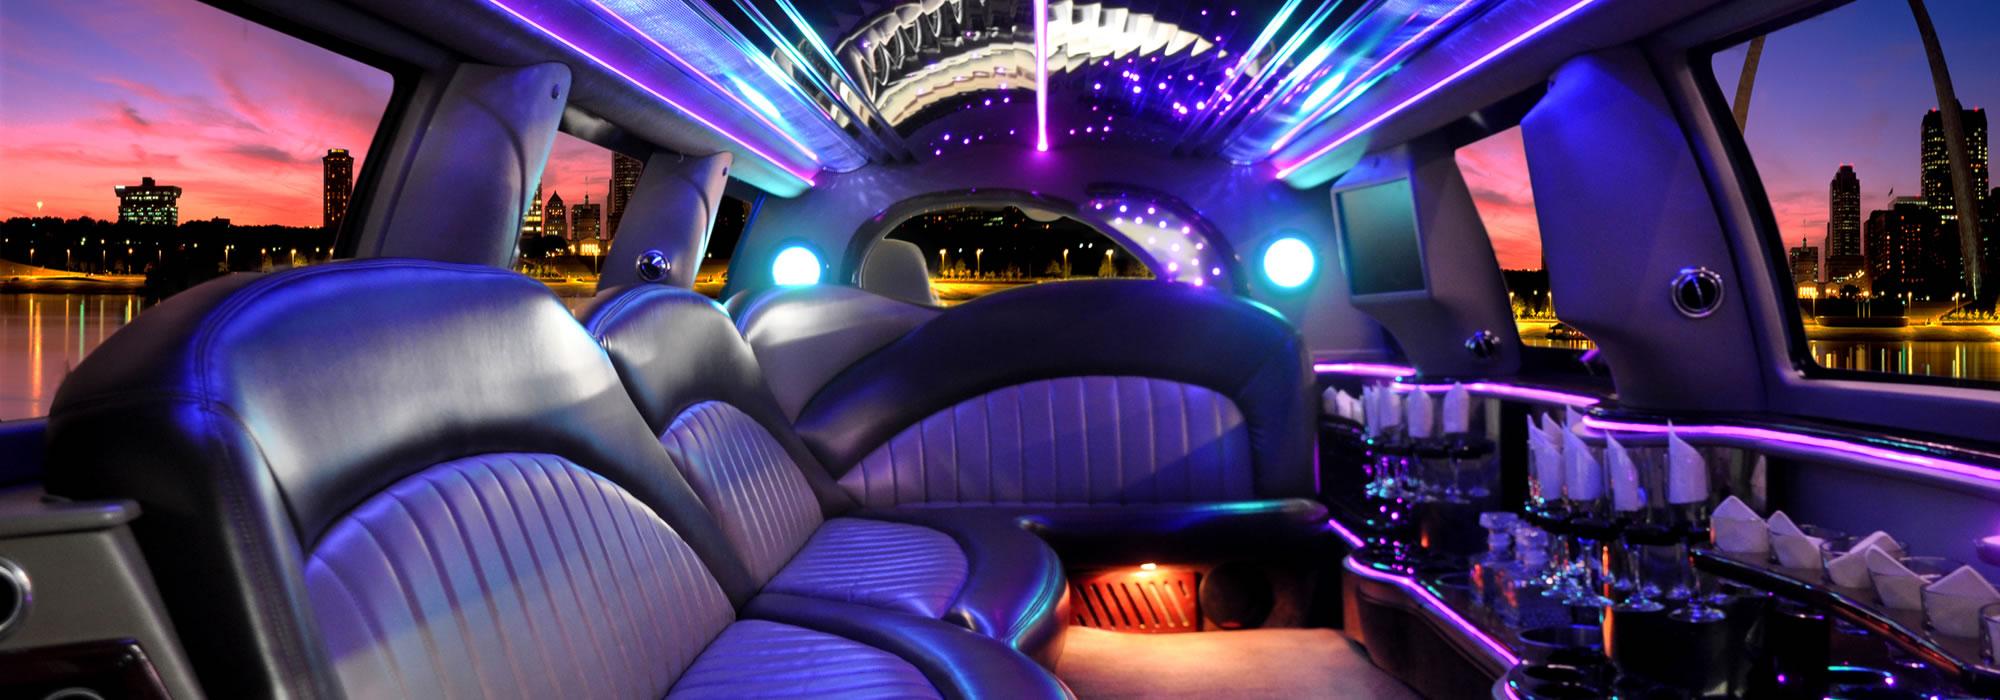 12-14-15-16-passenger-limo-long-island-new-york